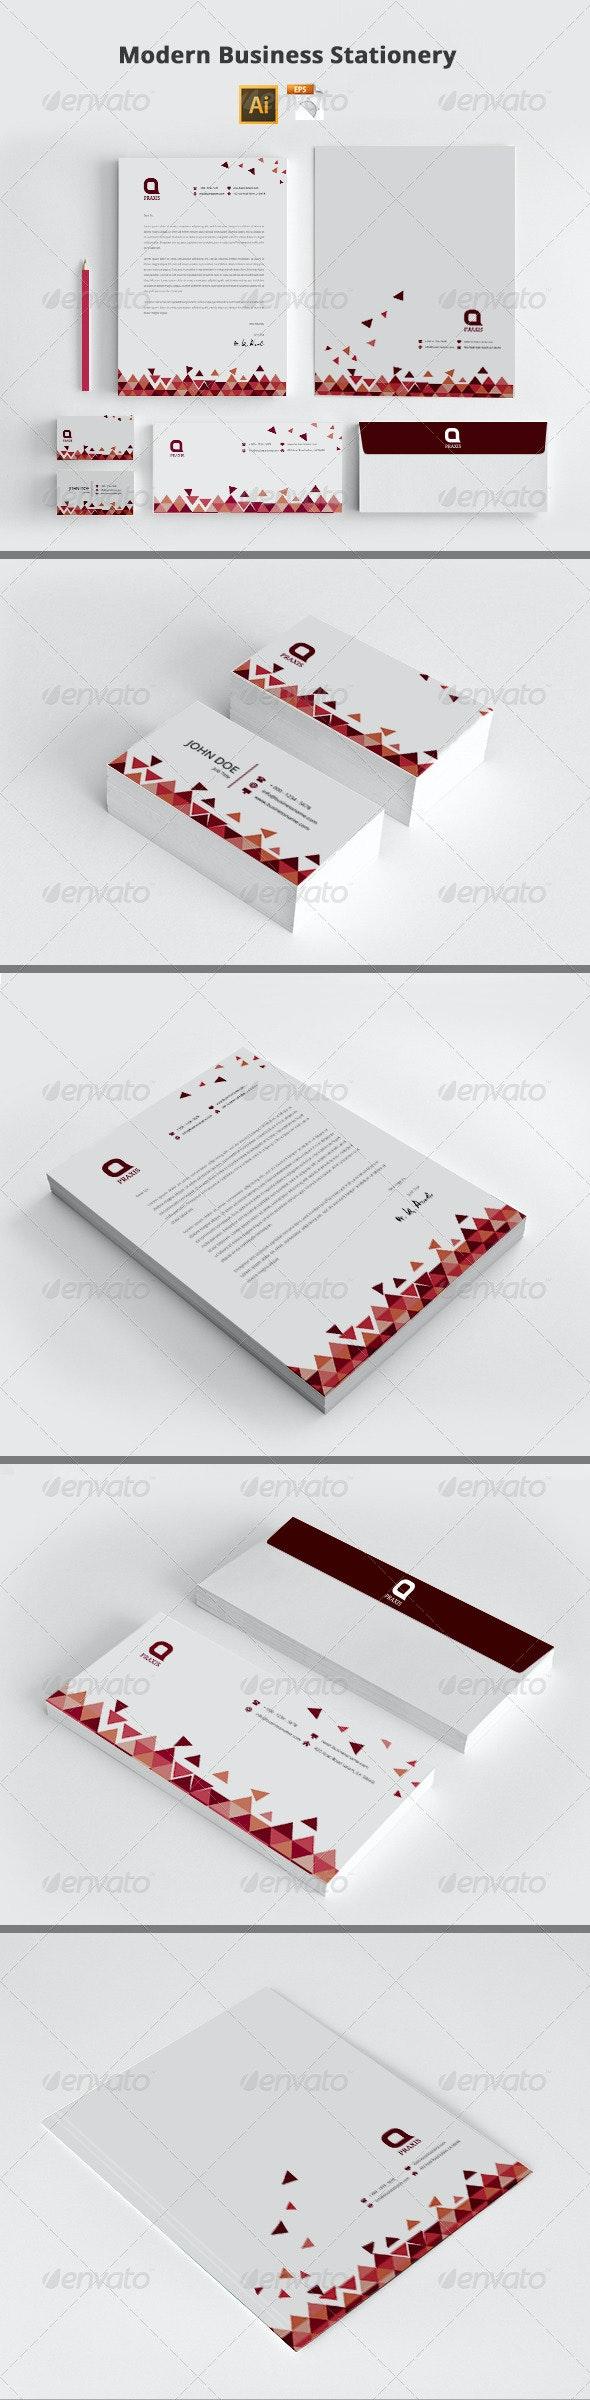 Modern Business Stationery - Stationery Print Templates